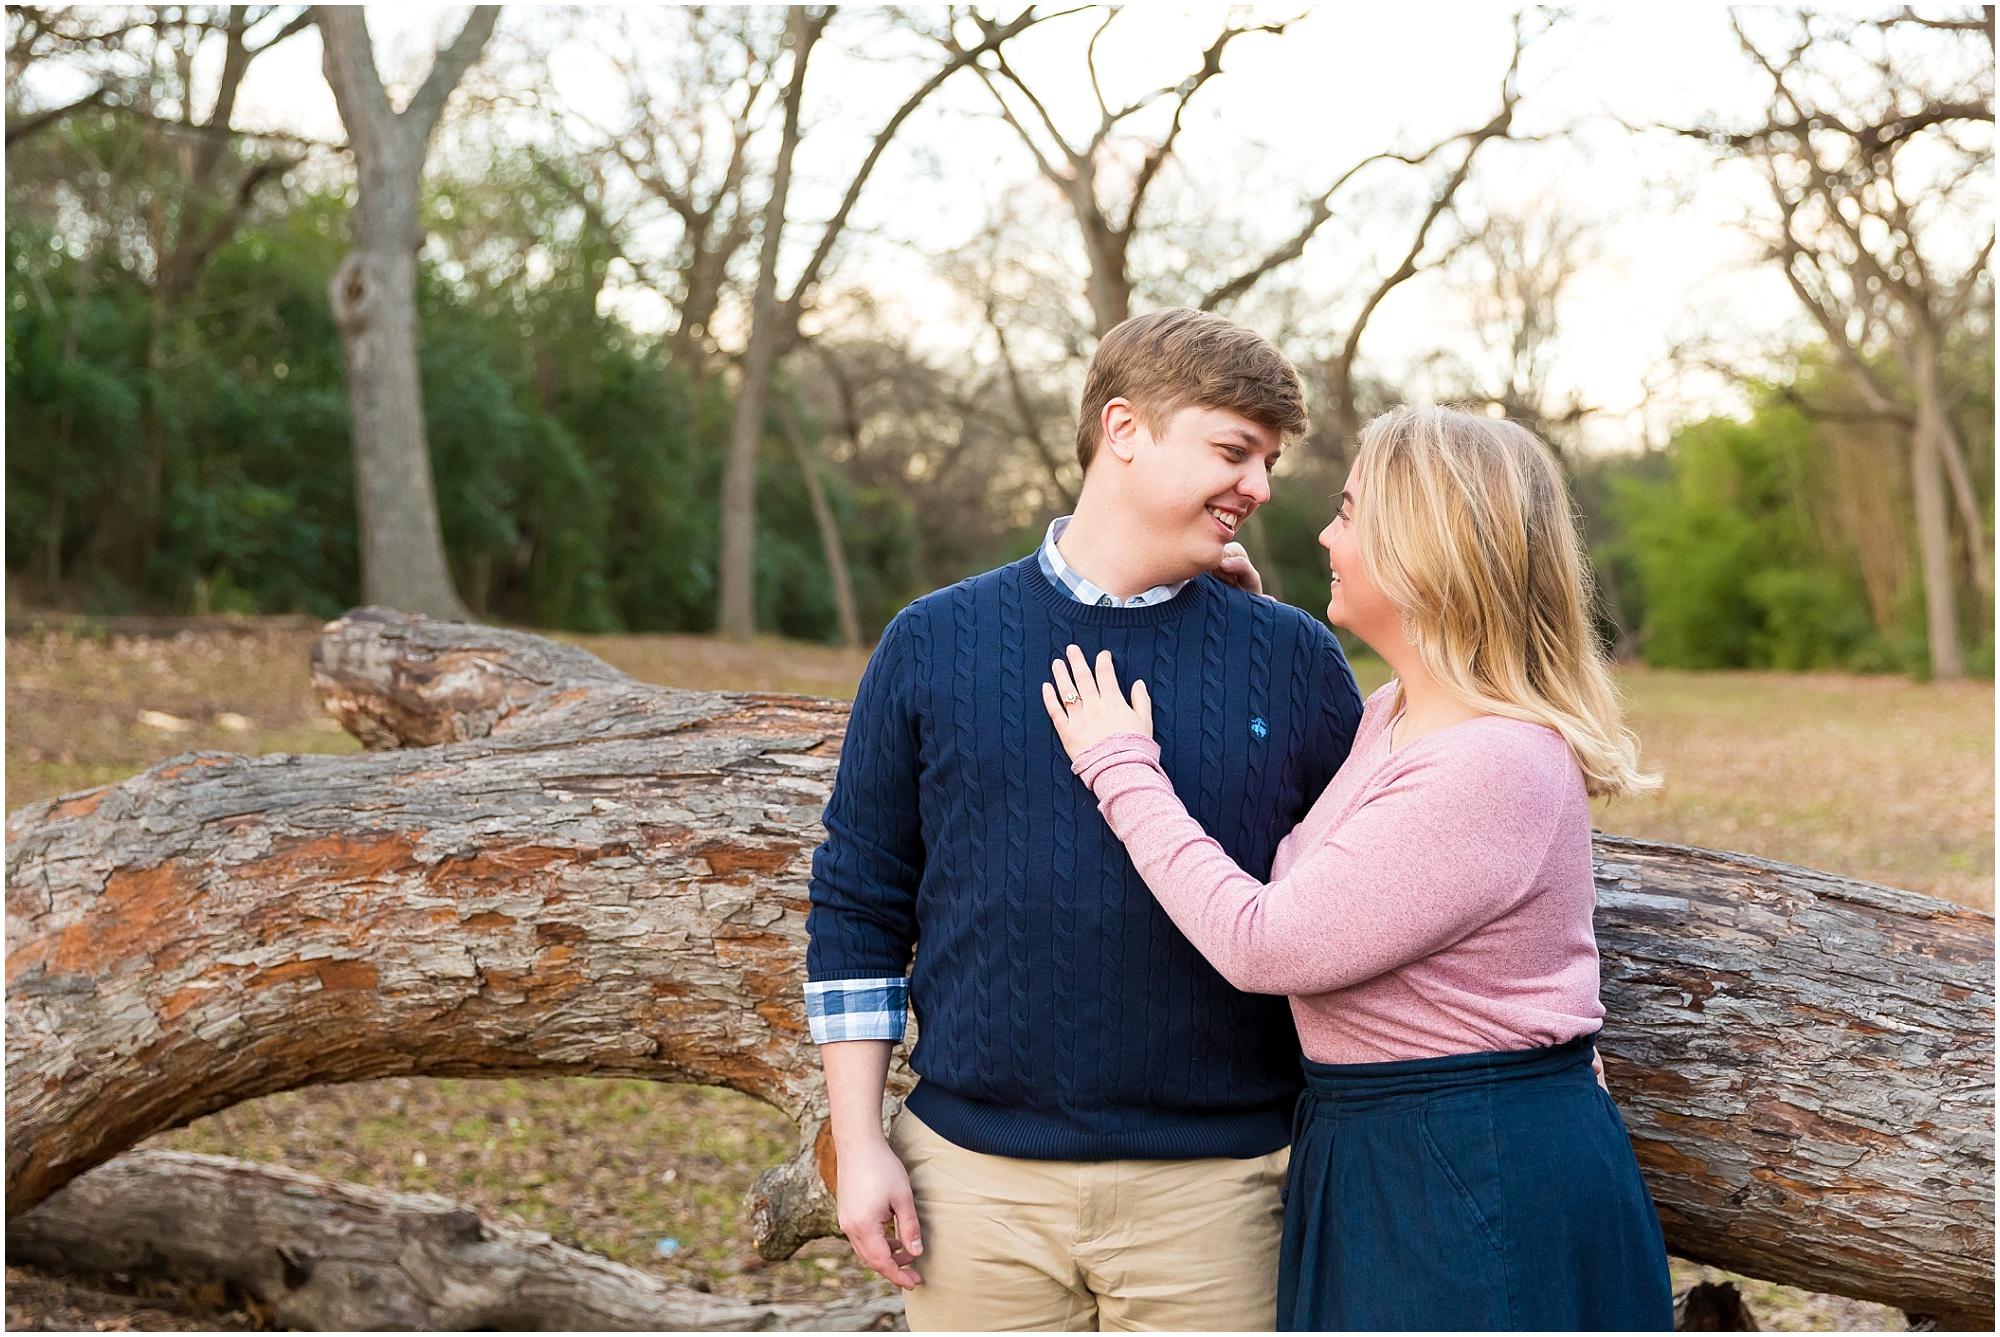 Sunrise-Engagements-Cameron-Park-Waco_0003.jpg